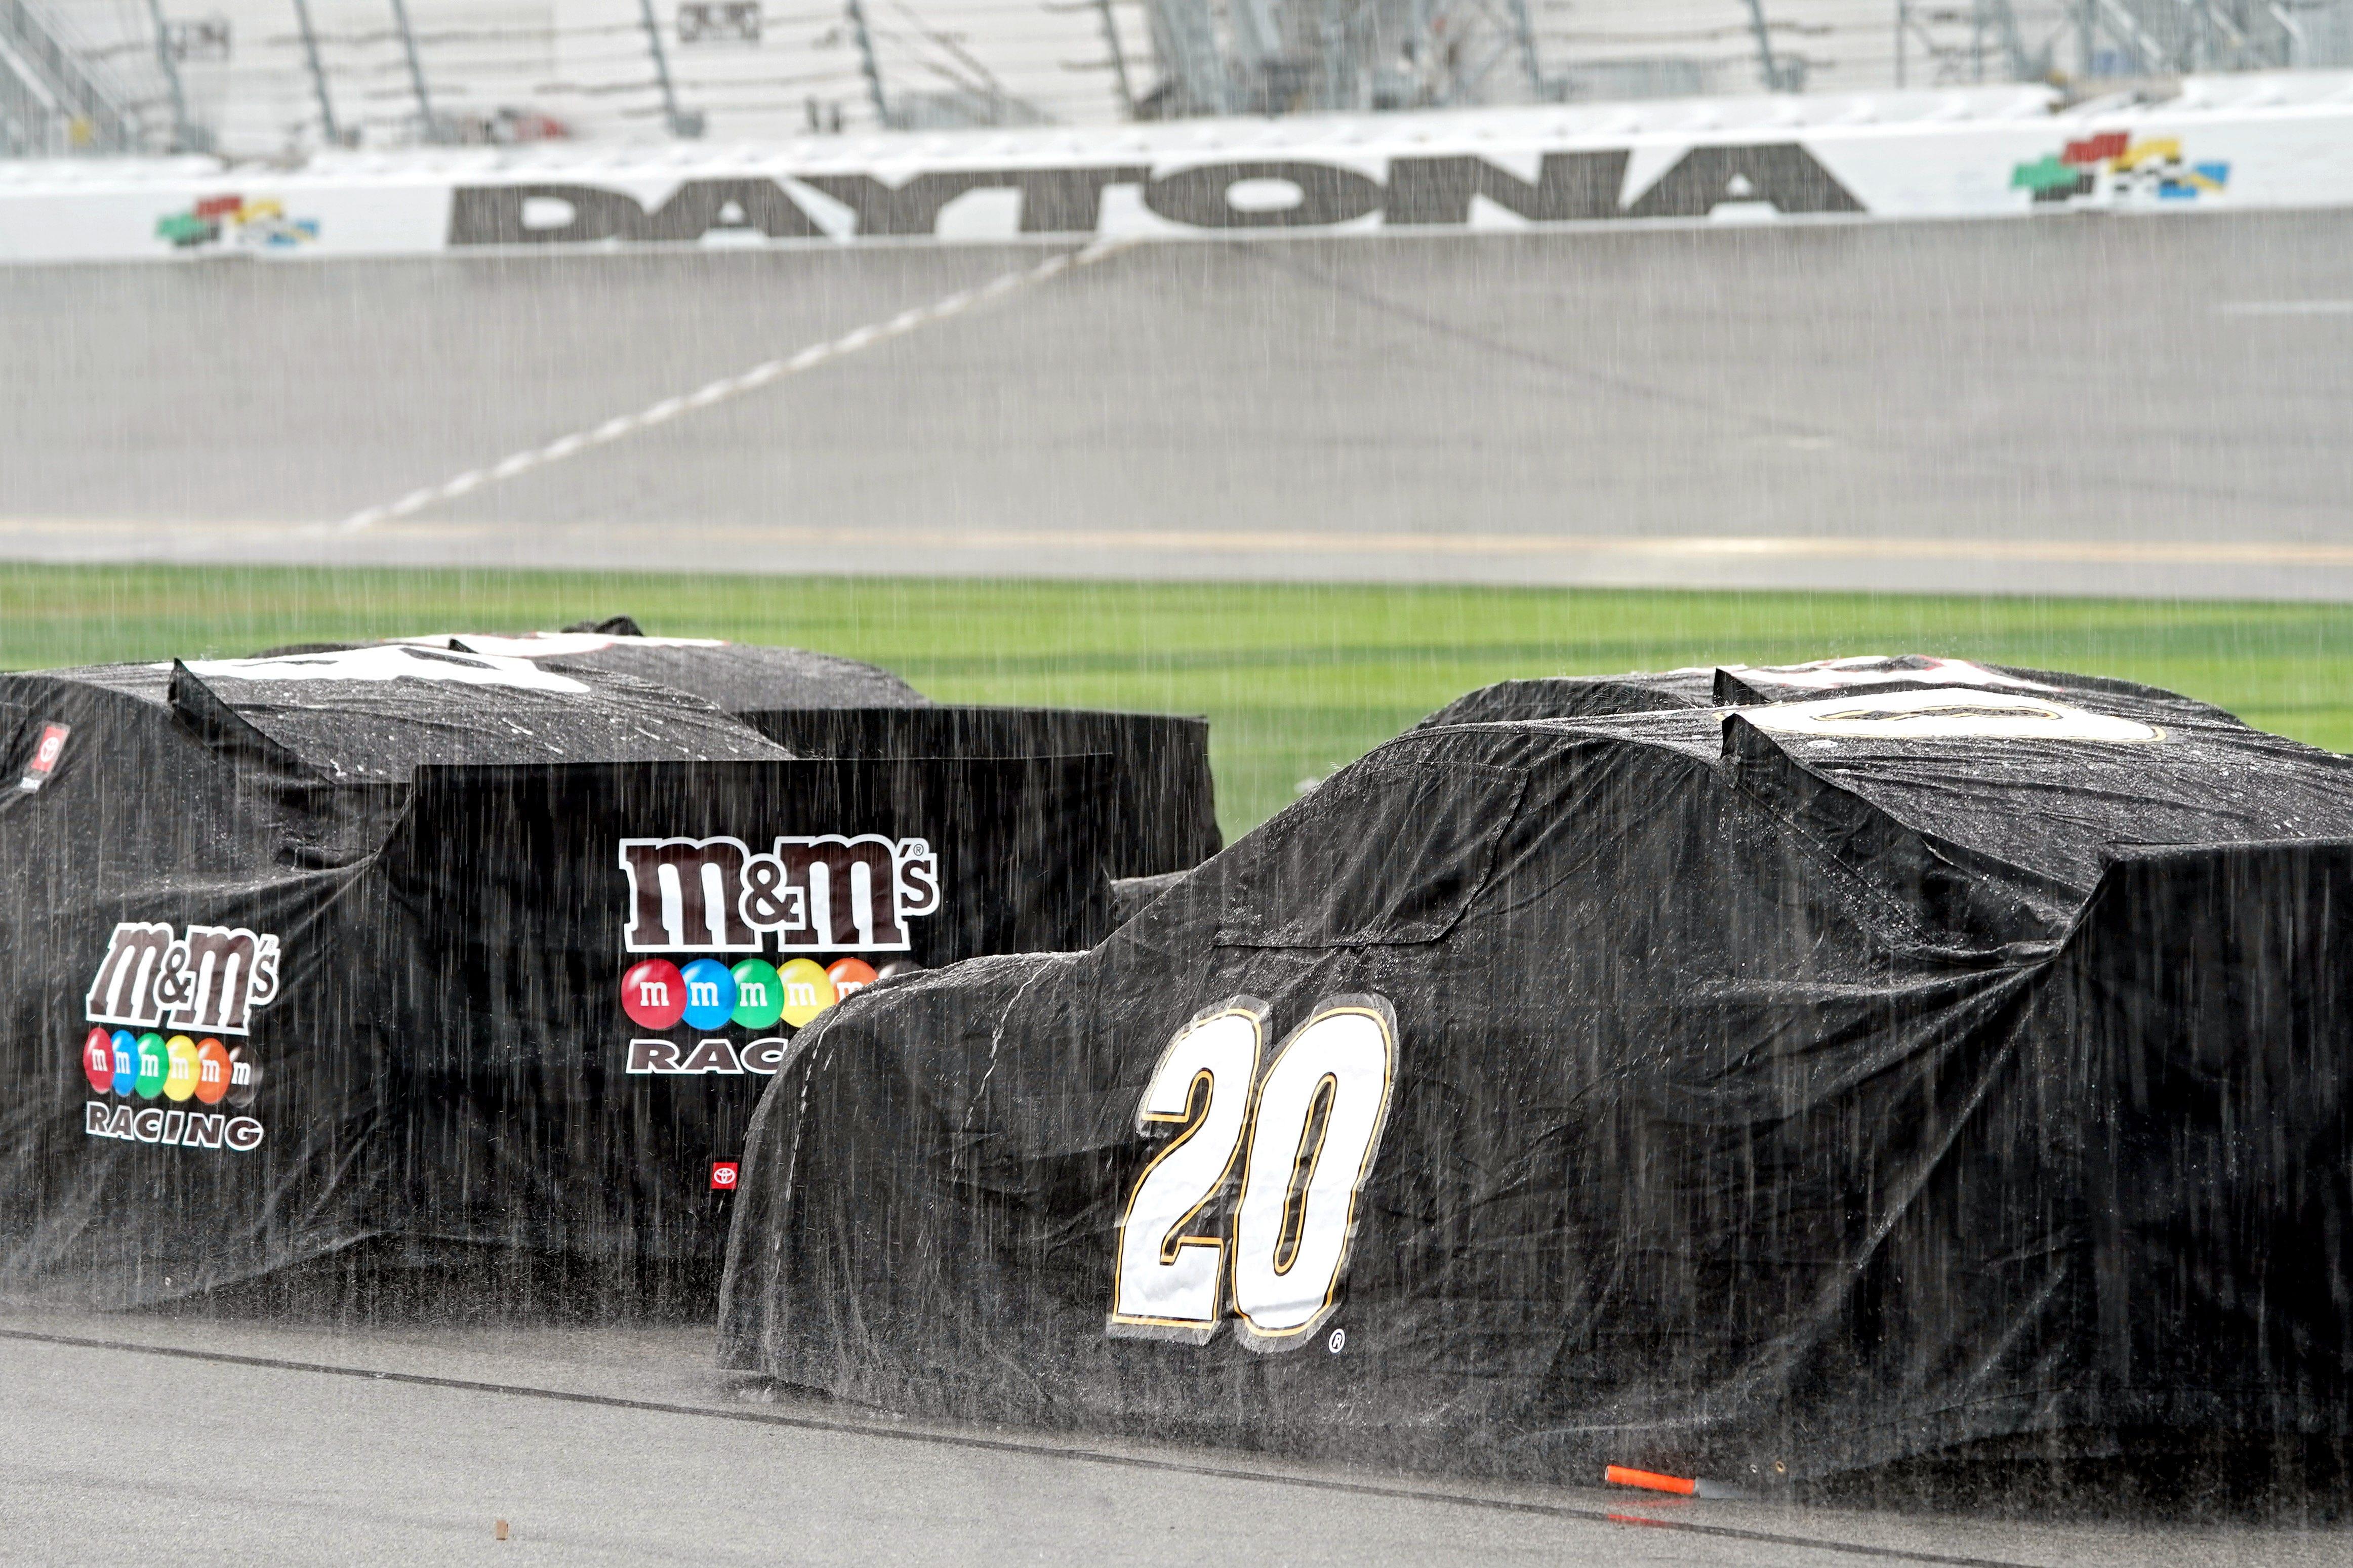 Daytona 500 postponed until Monday afternoon after rain pounds track